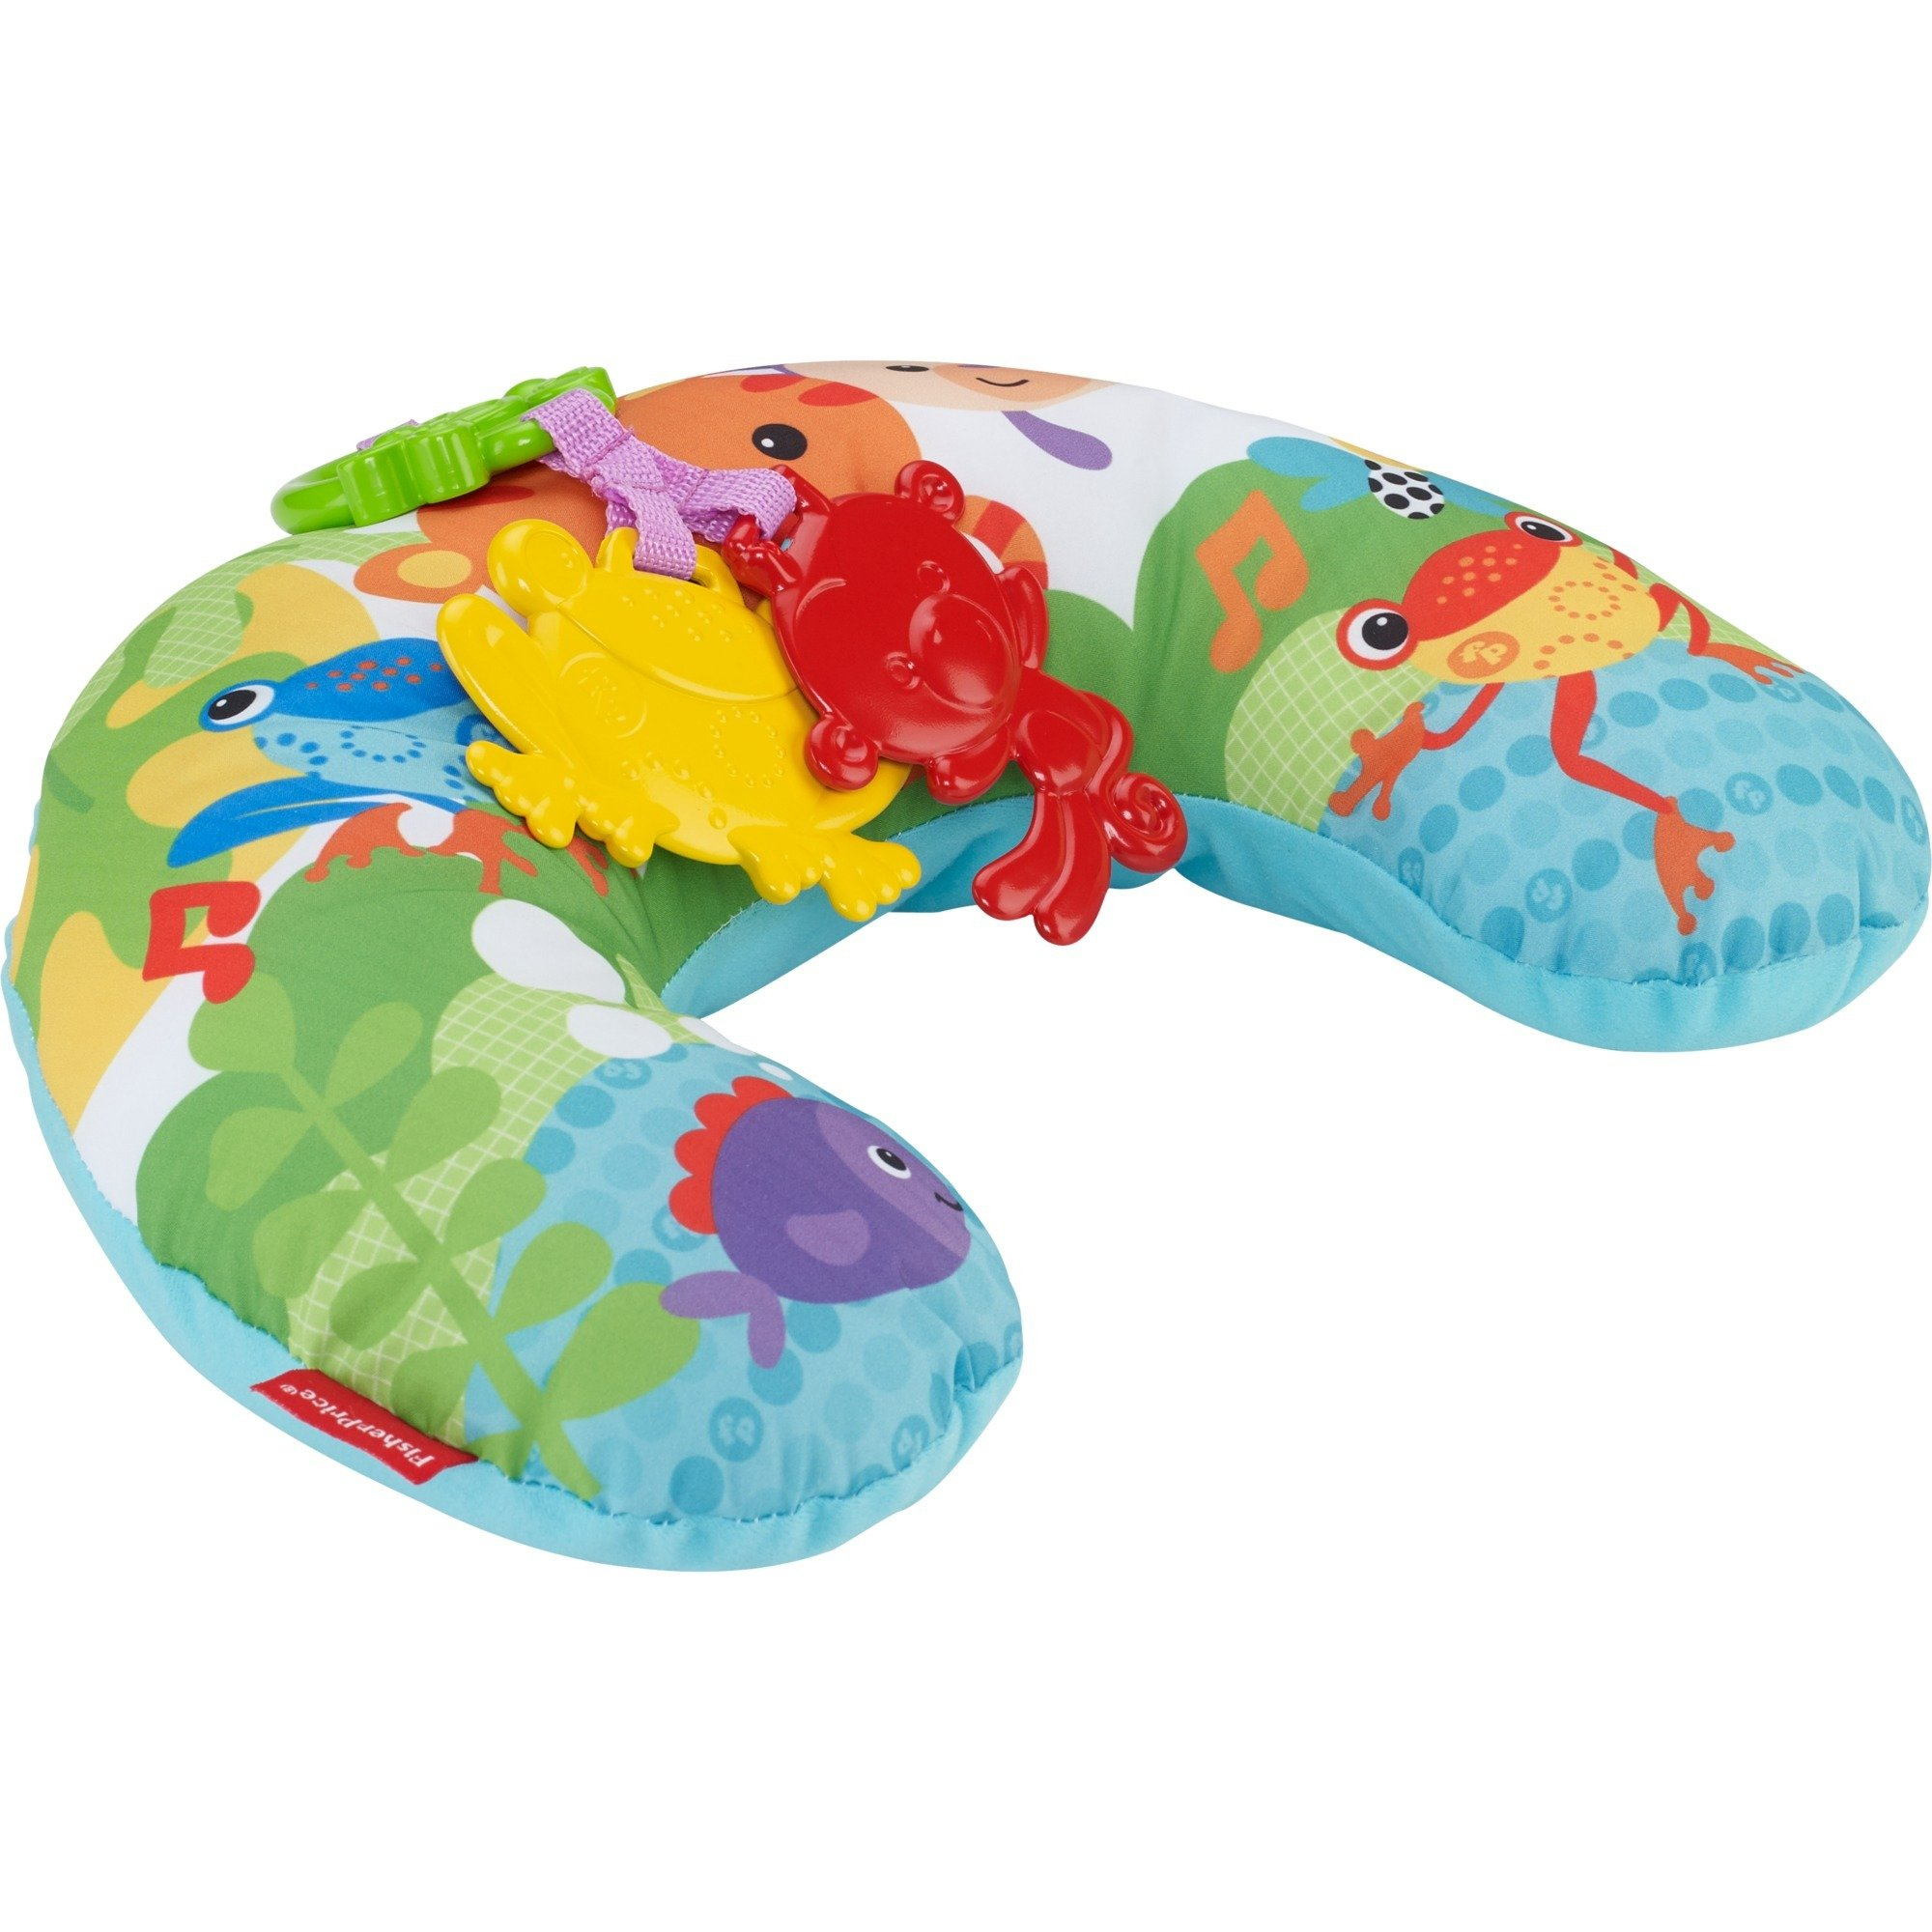 rainforest-play-cushion-legetappe